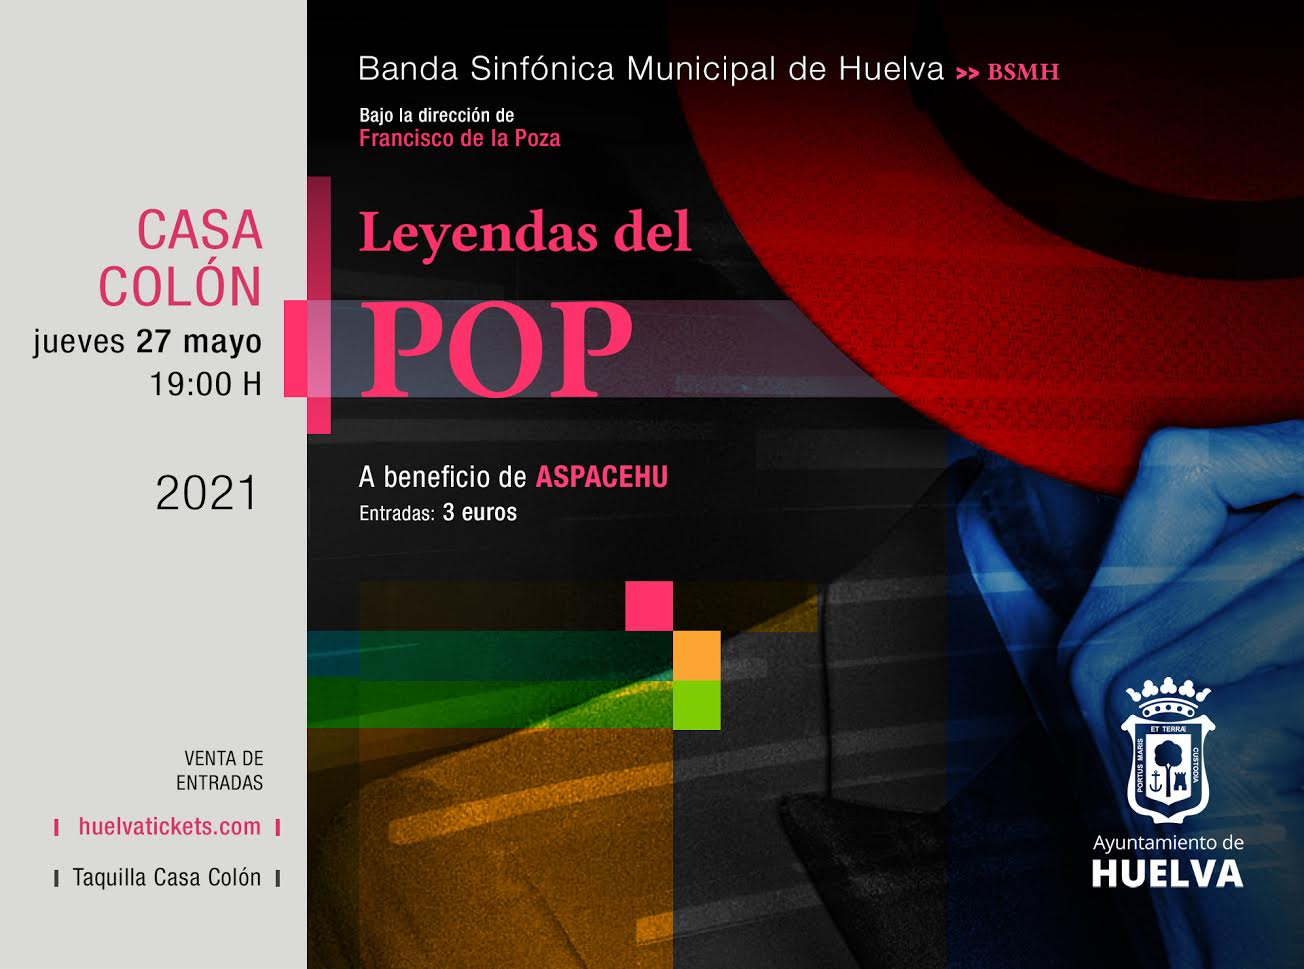 Leyendas del POP, Banda Sinfónica Municipal de Huelva